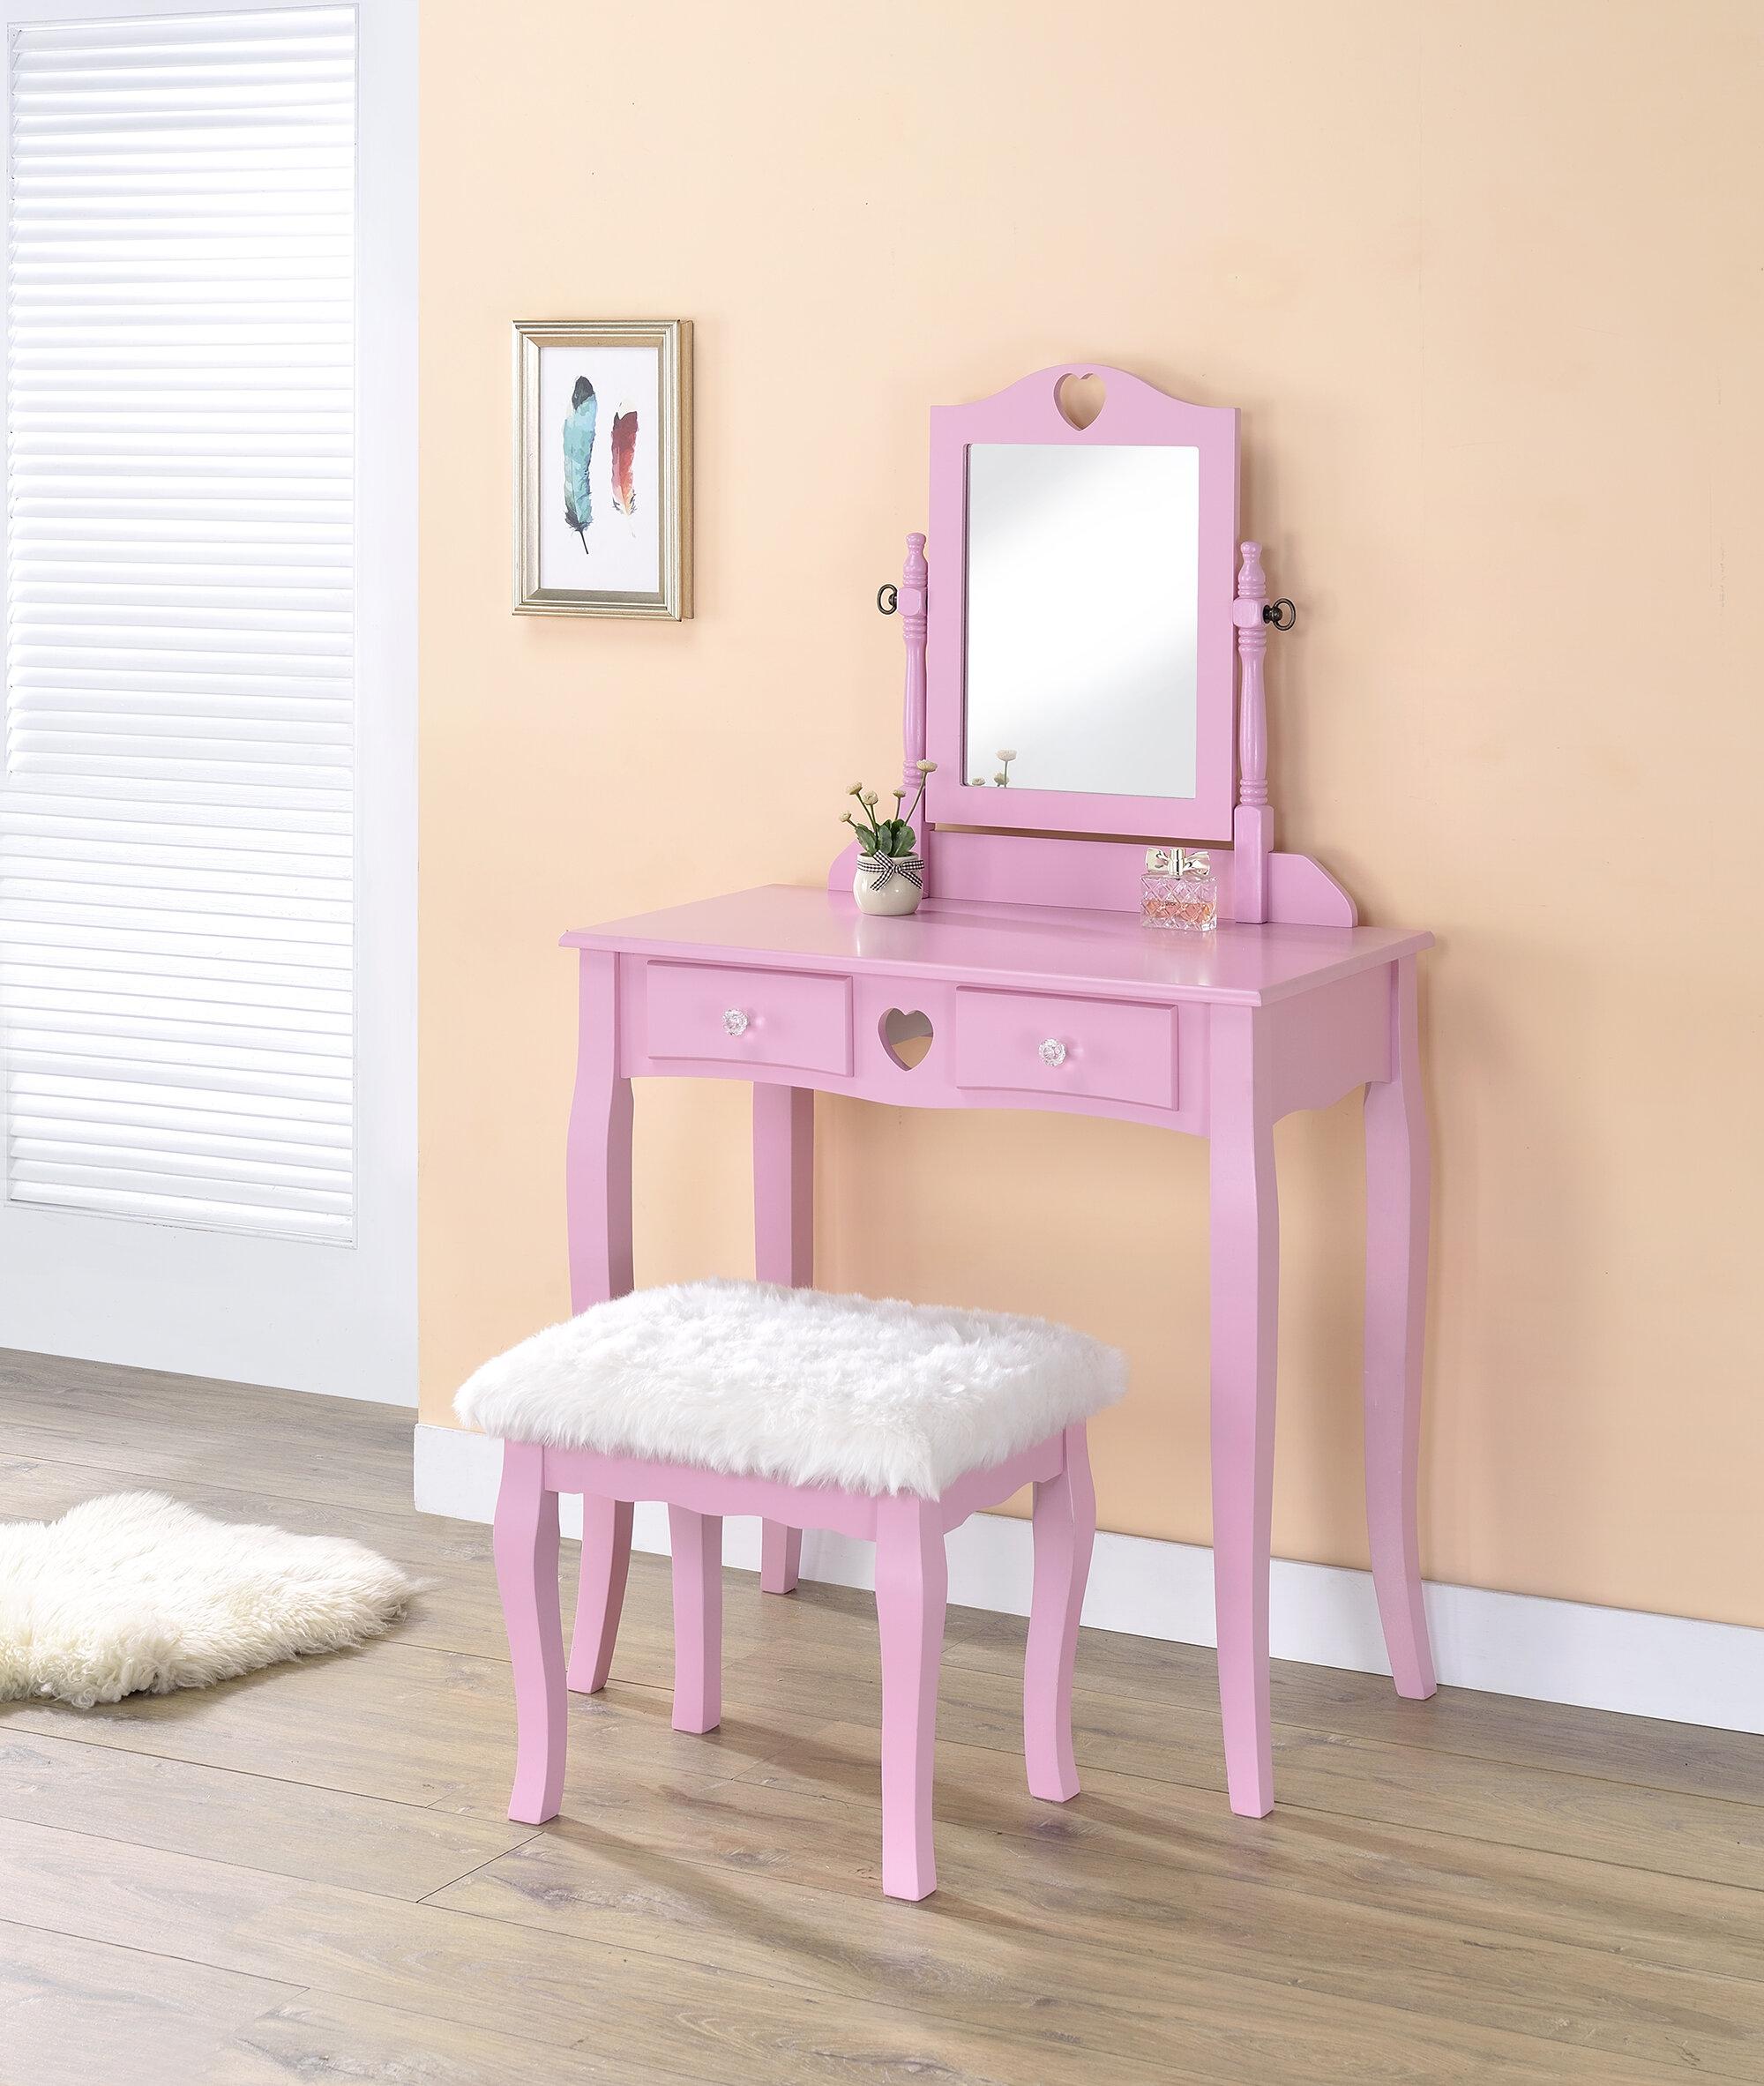 Vanity Set Stool Included Winston Porter Small Bedroom Vanities You Ll Love In 2021 Wayfair